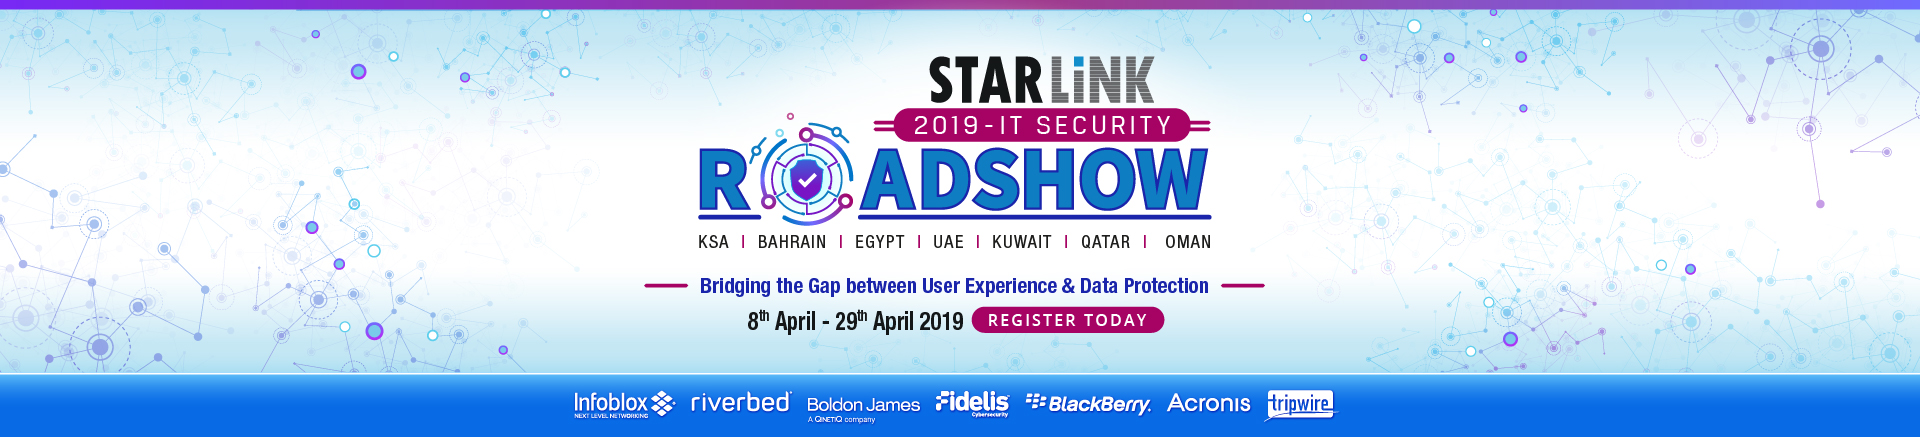 StarLink IT Security Roadshow